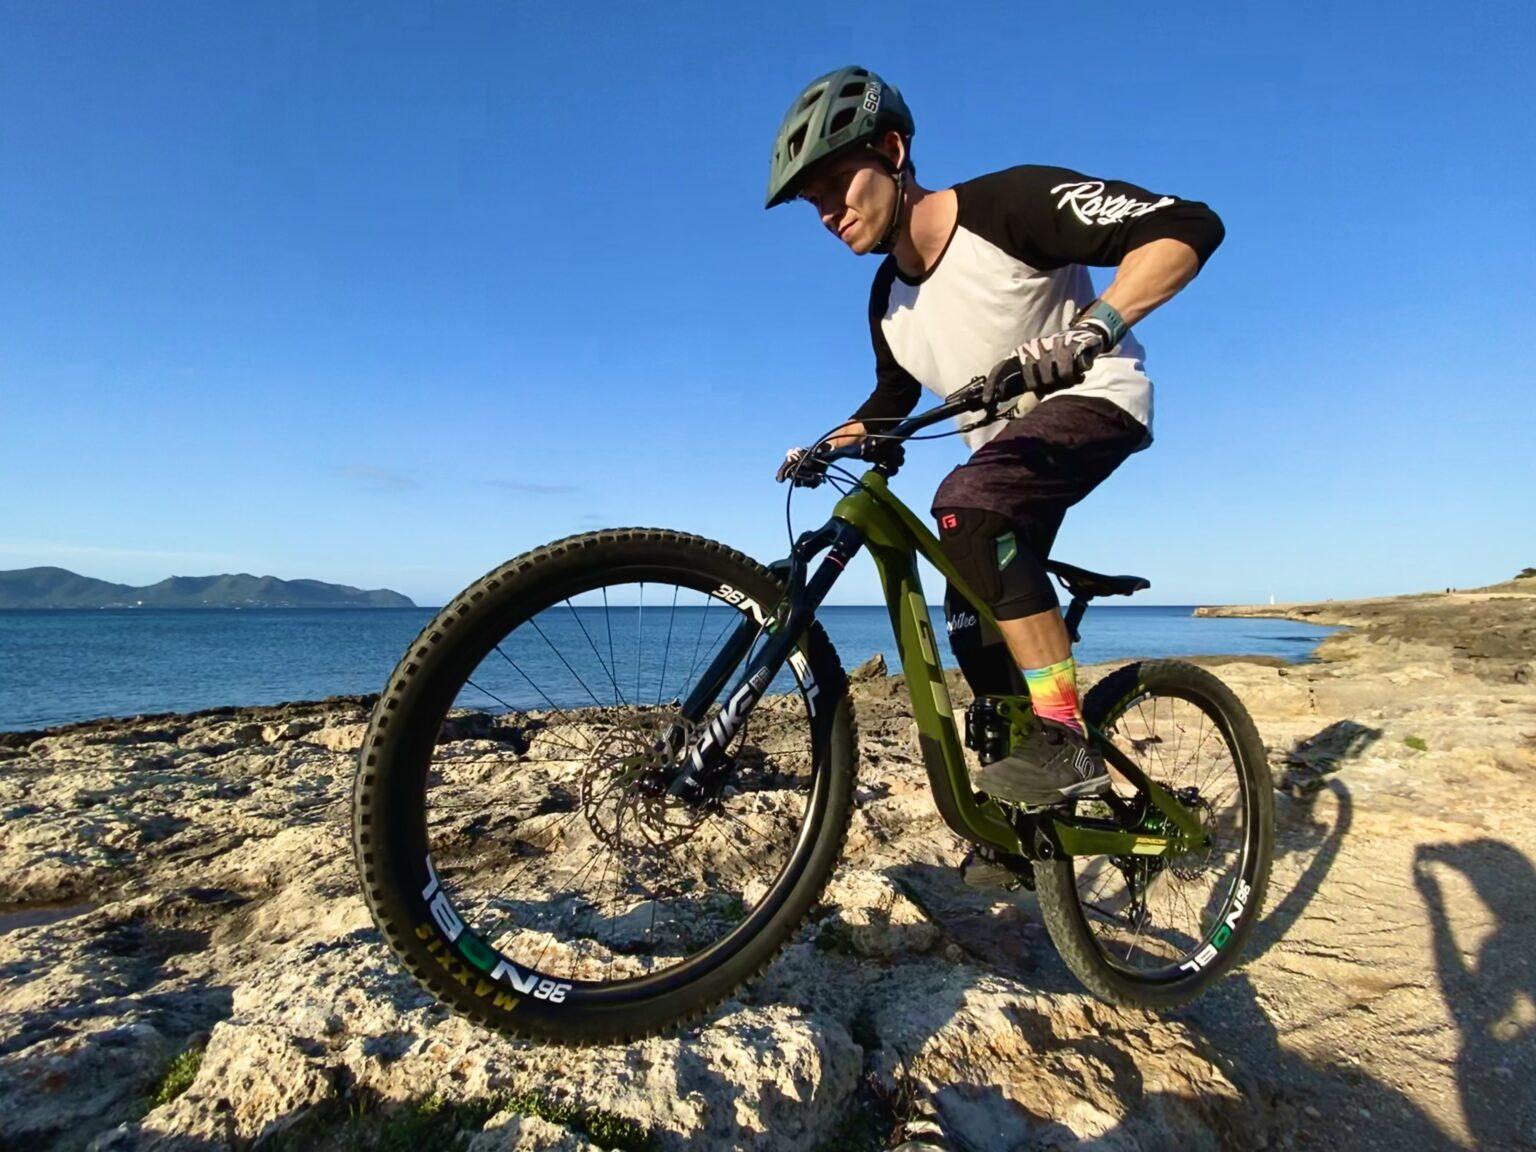 Bike Body Seperation in der MTB Fahrtechnik